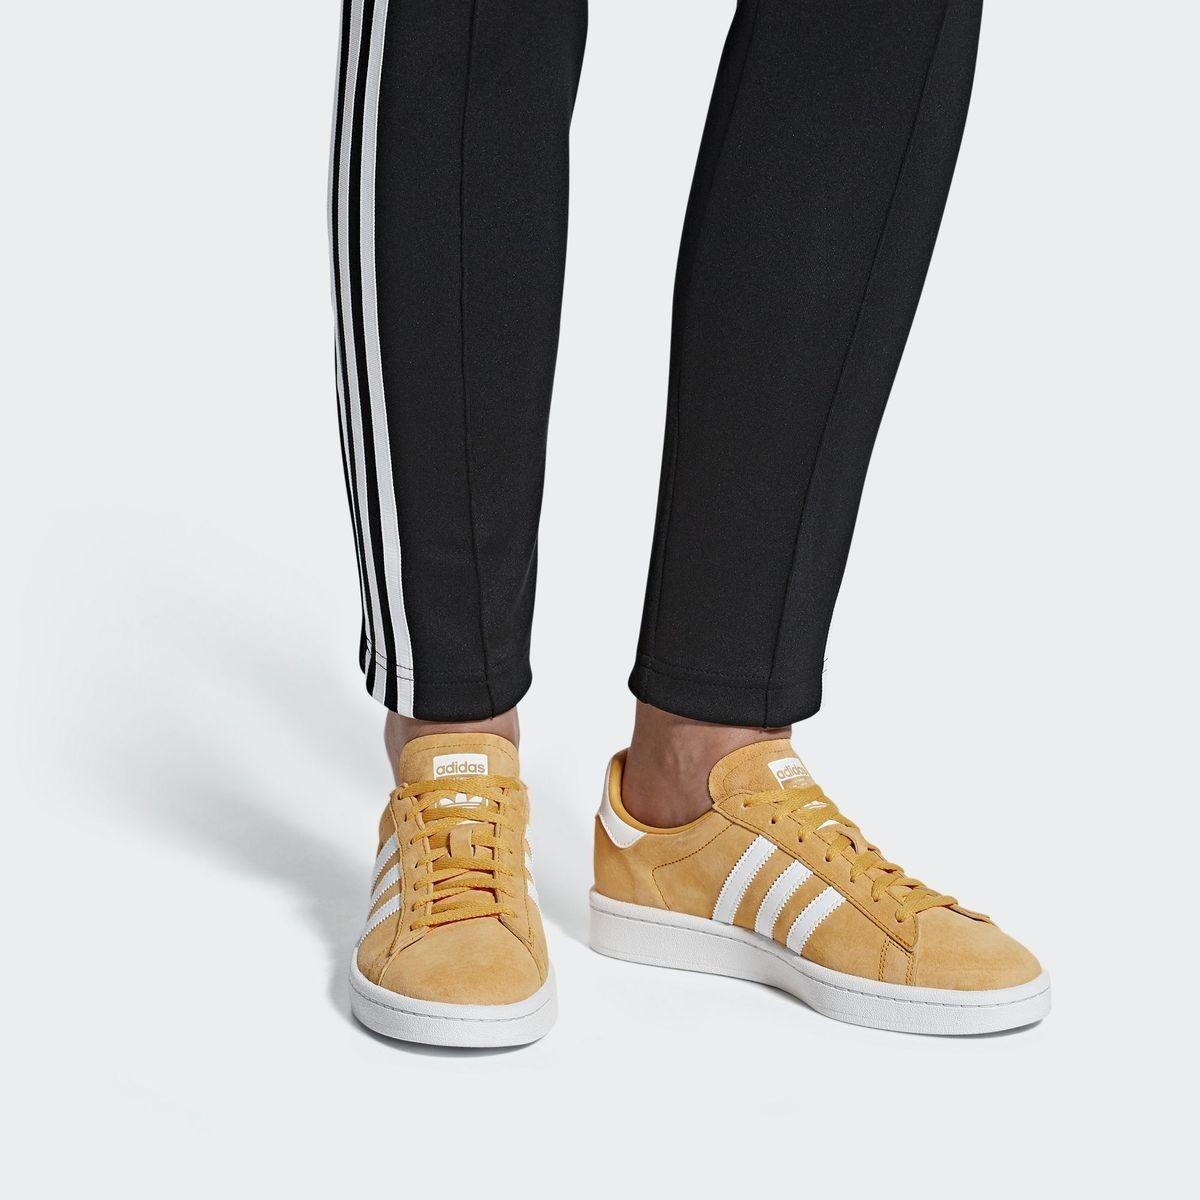 adidas campus femme kaki